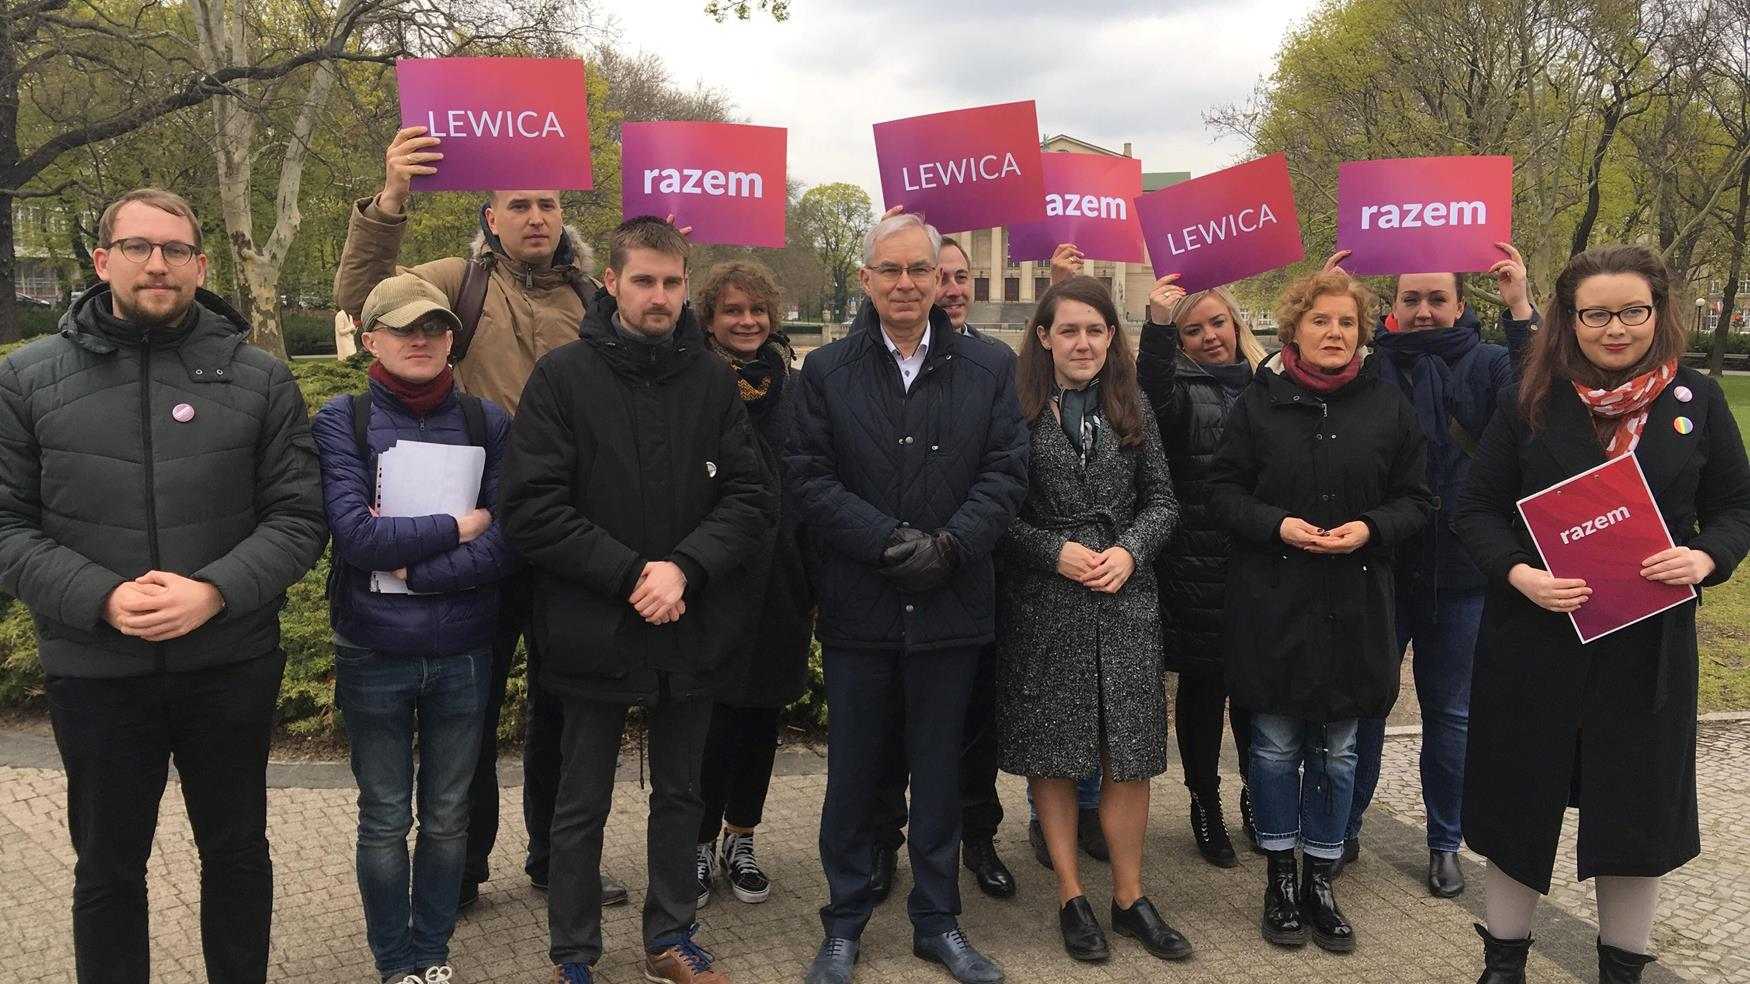 lewica razem parlament europejski - Jacek Butlewski